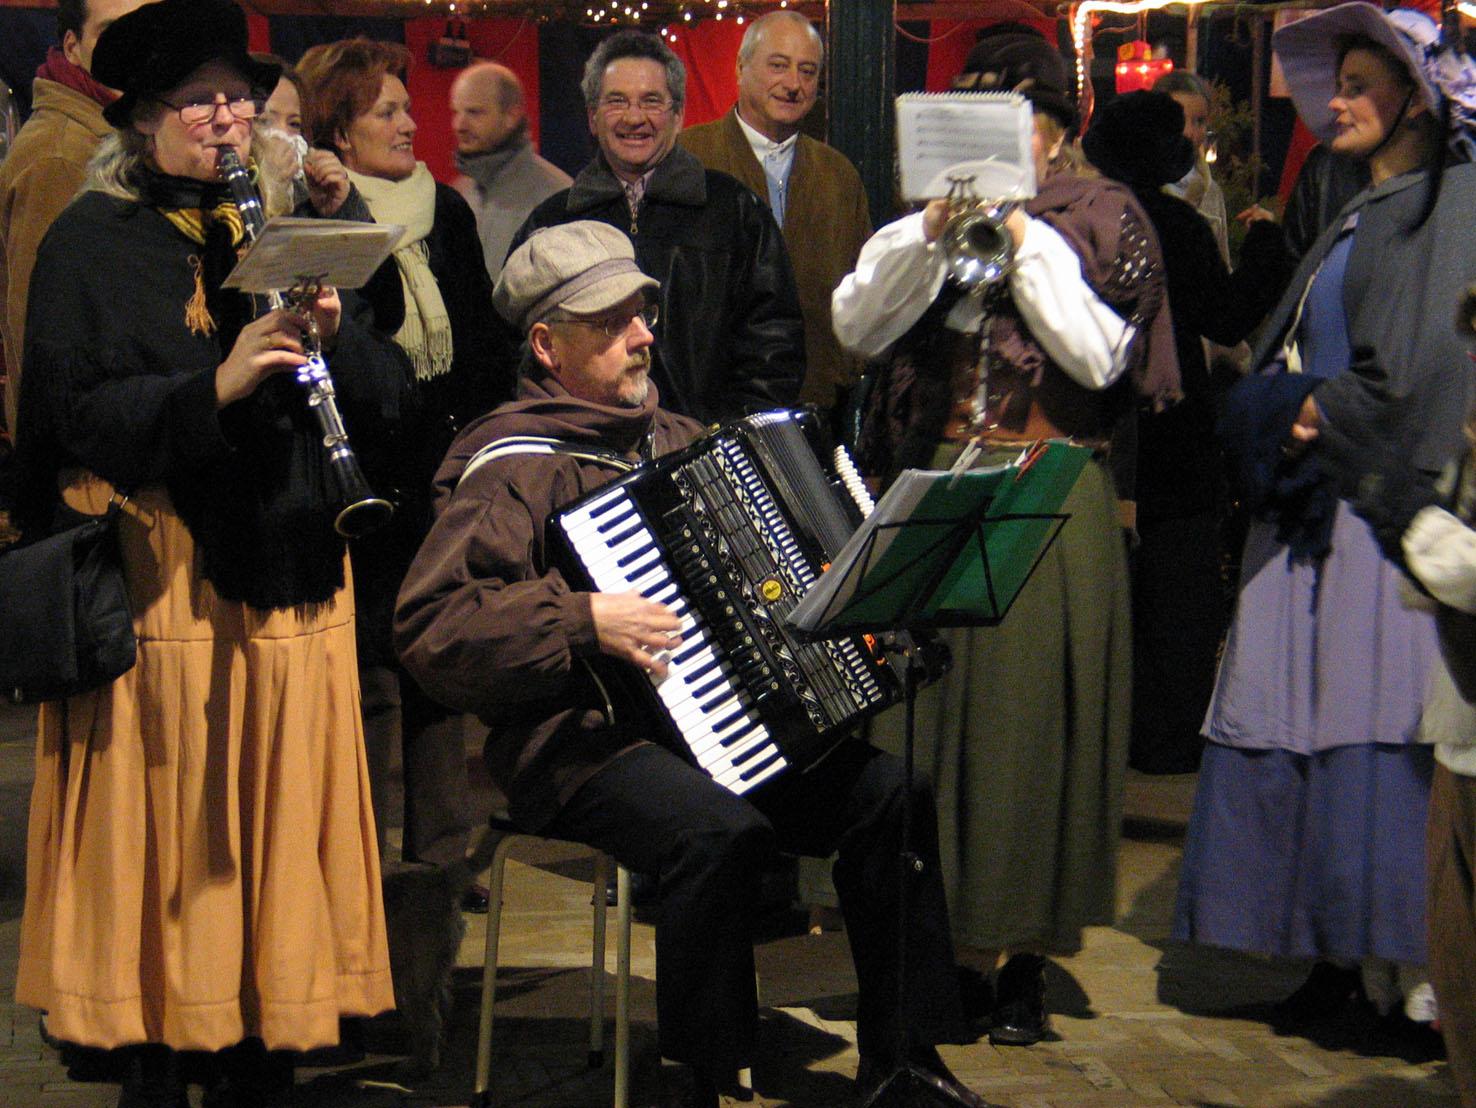 160 - Kerstmarkt Helmond 2003.jpg